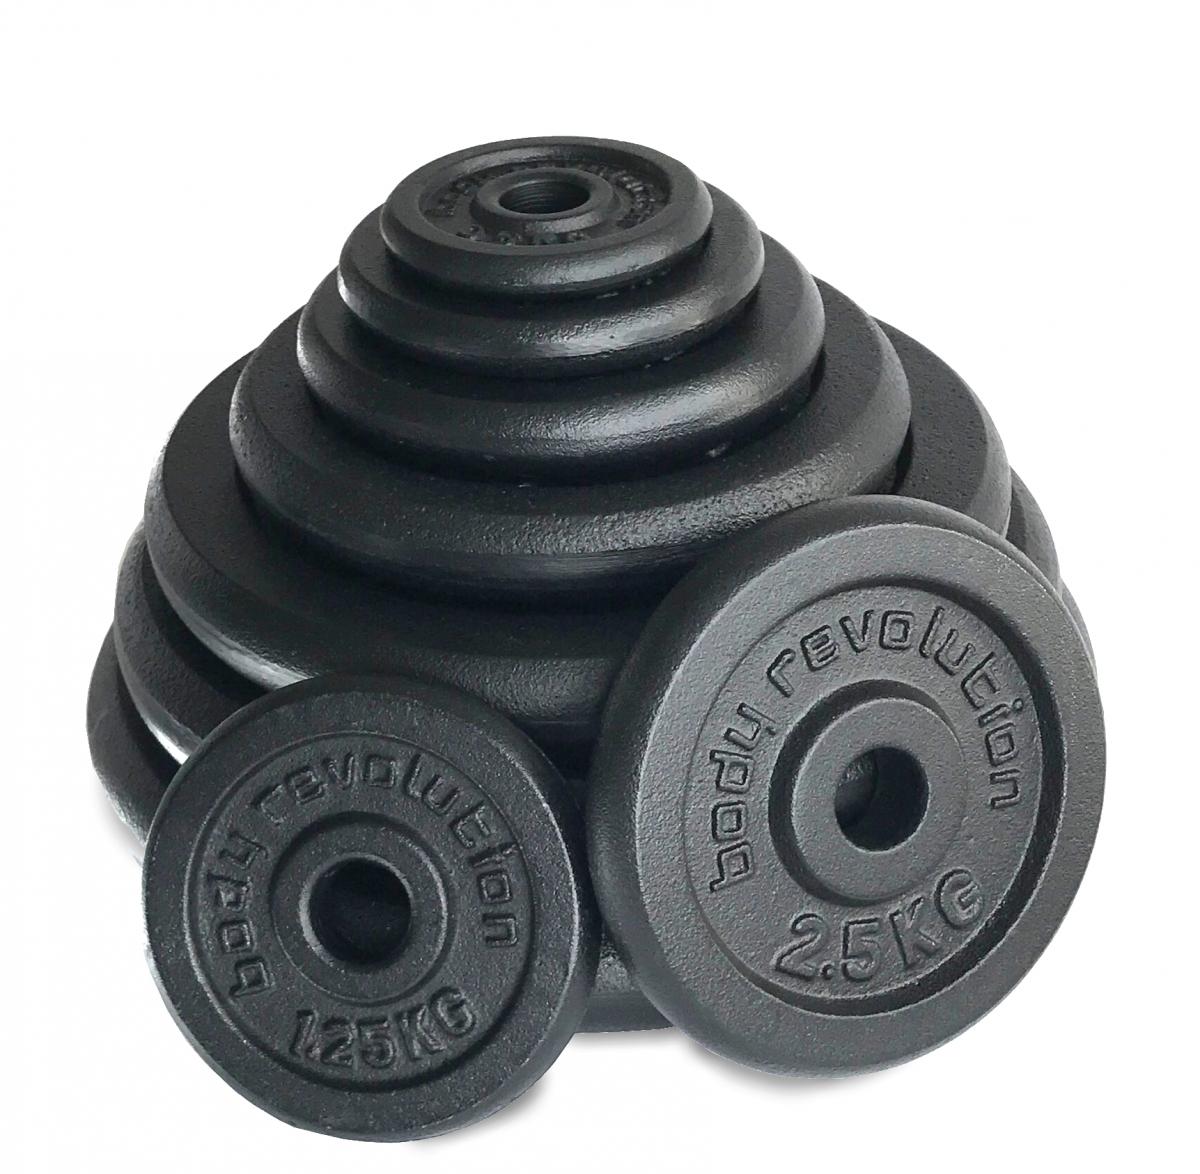 BodyRip Cast Iron 1 Standard 2 x 25kg Weight Plates Discs Weights Gym Muscle Fitness